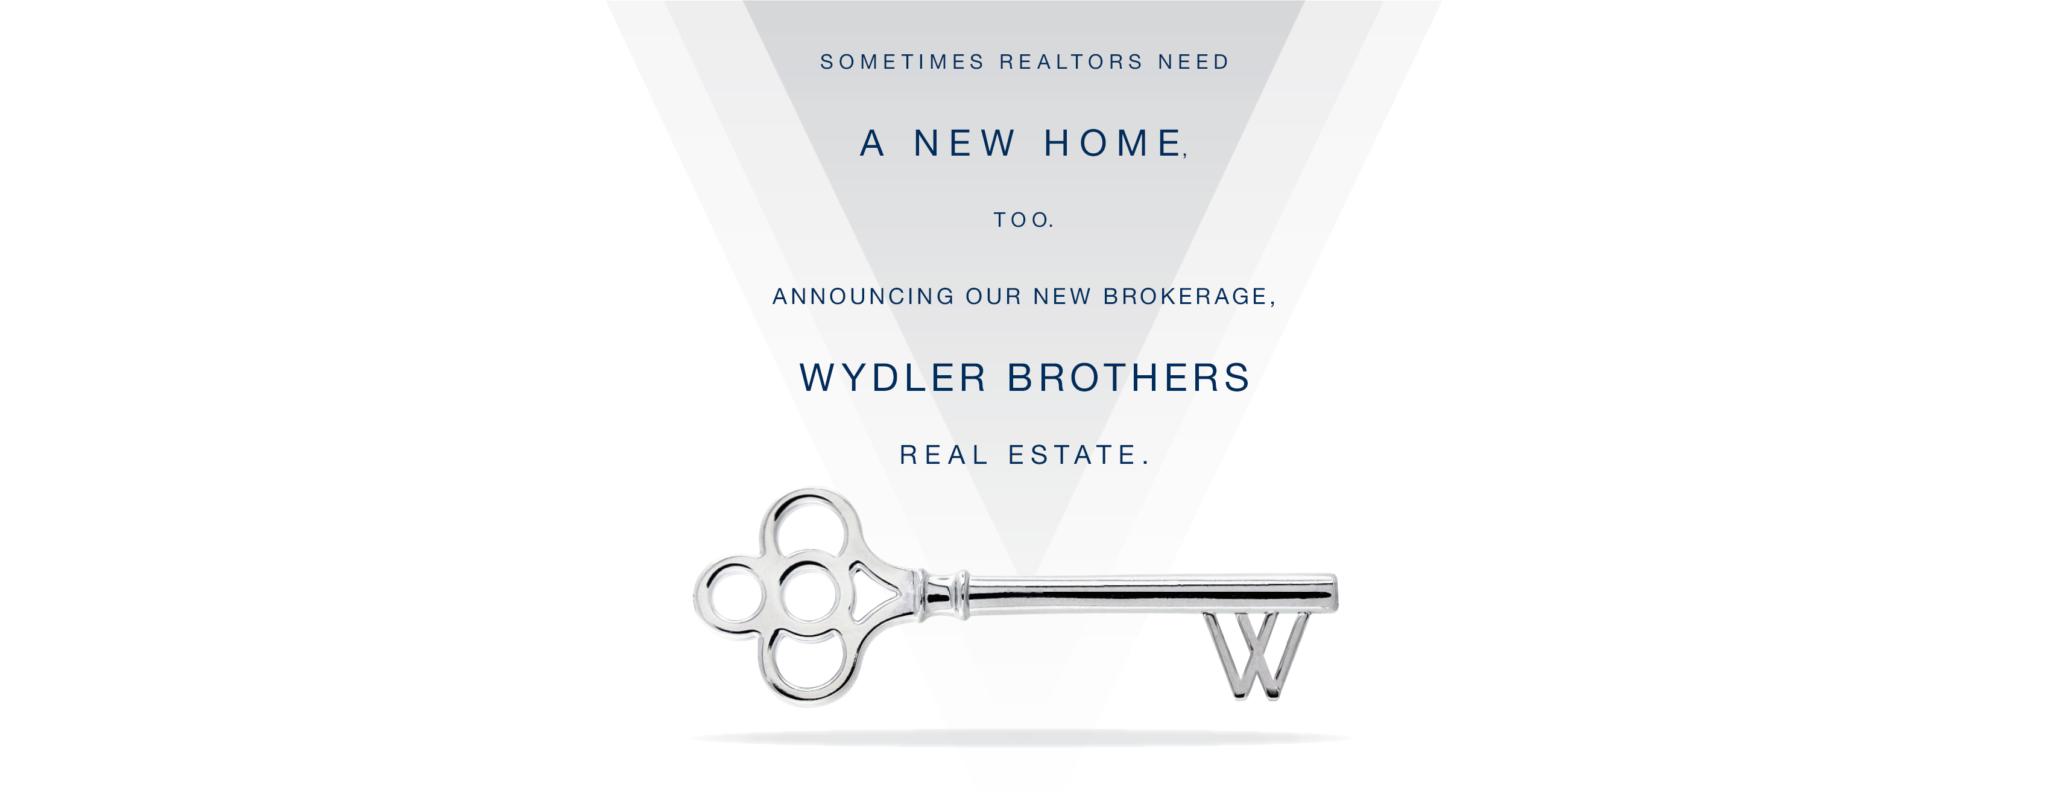 Wydler brothers real estate